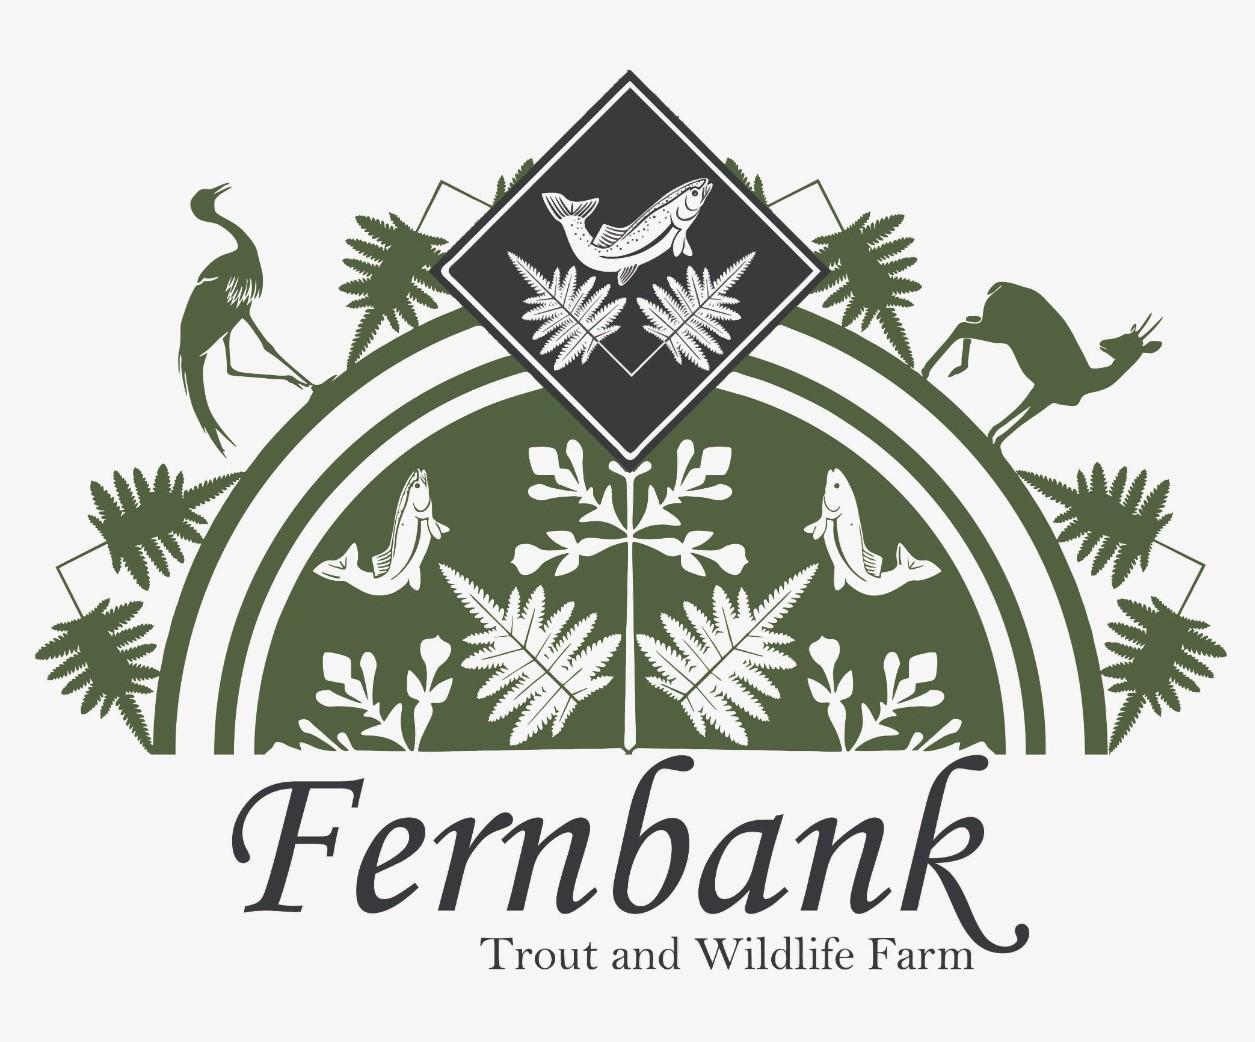 fernbank.co.za